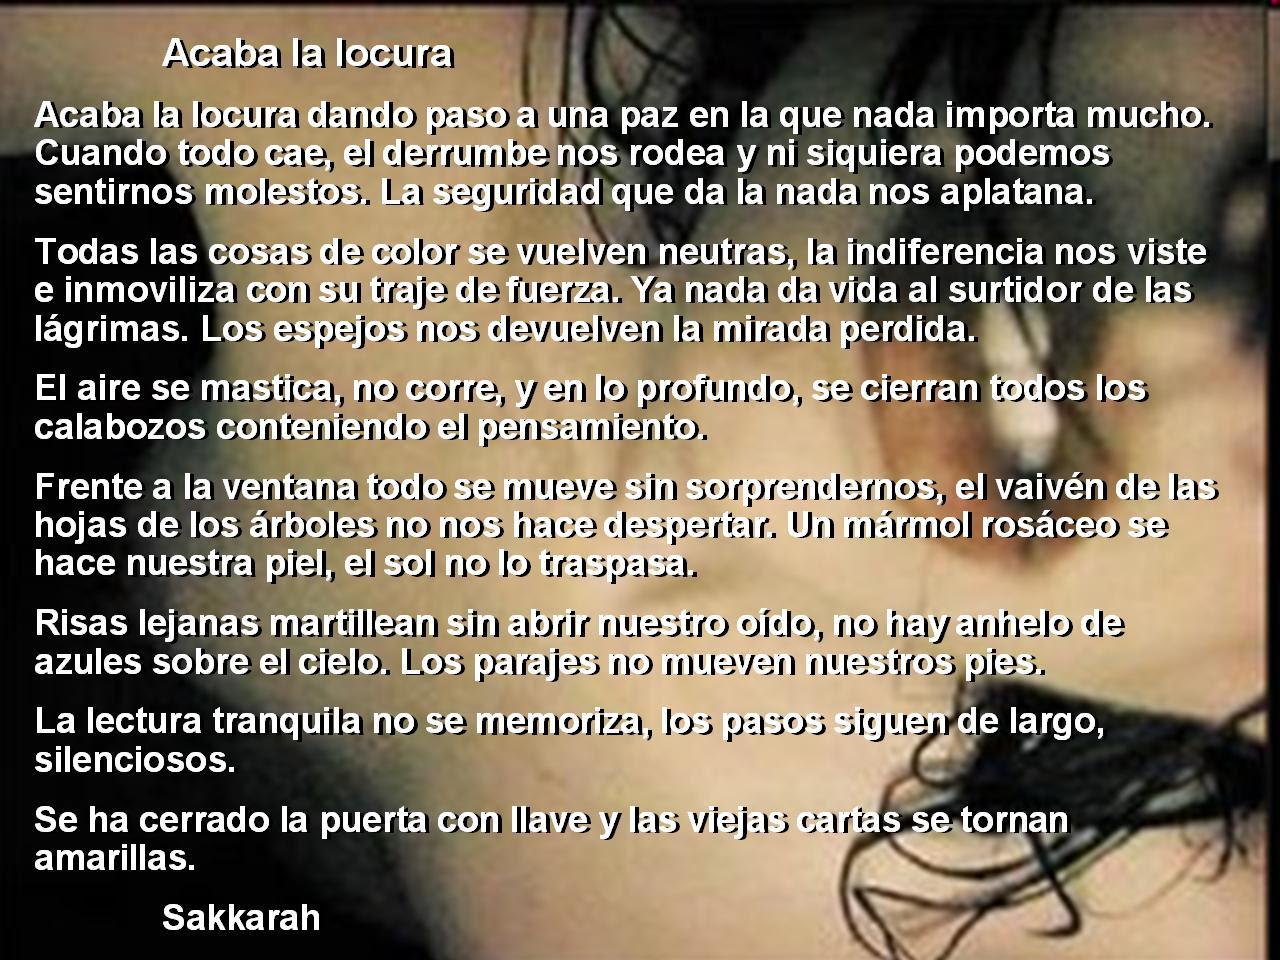 http://anaan.files.wordpress.com/2011/09/bucanera-094-acaba-la-locura.jpg